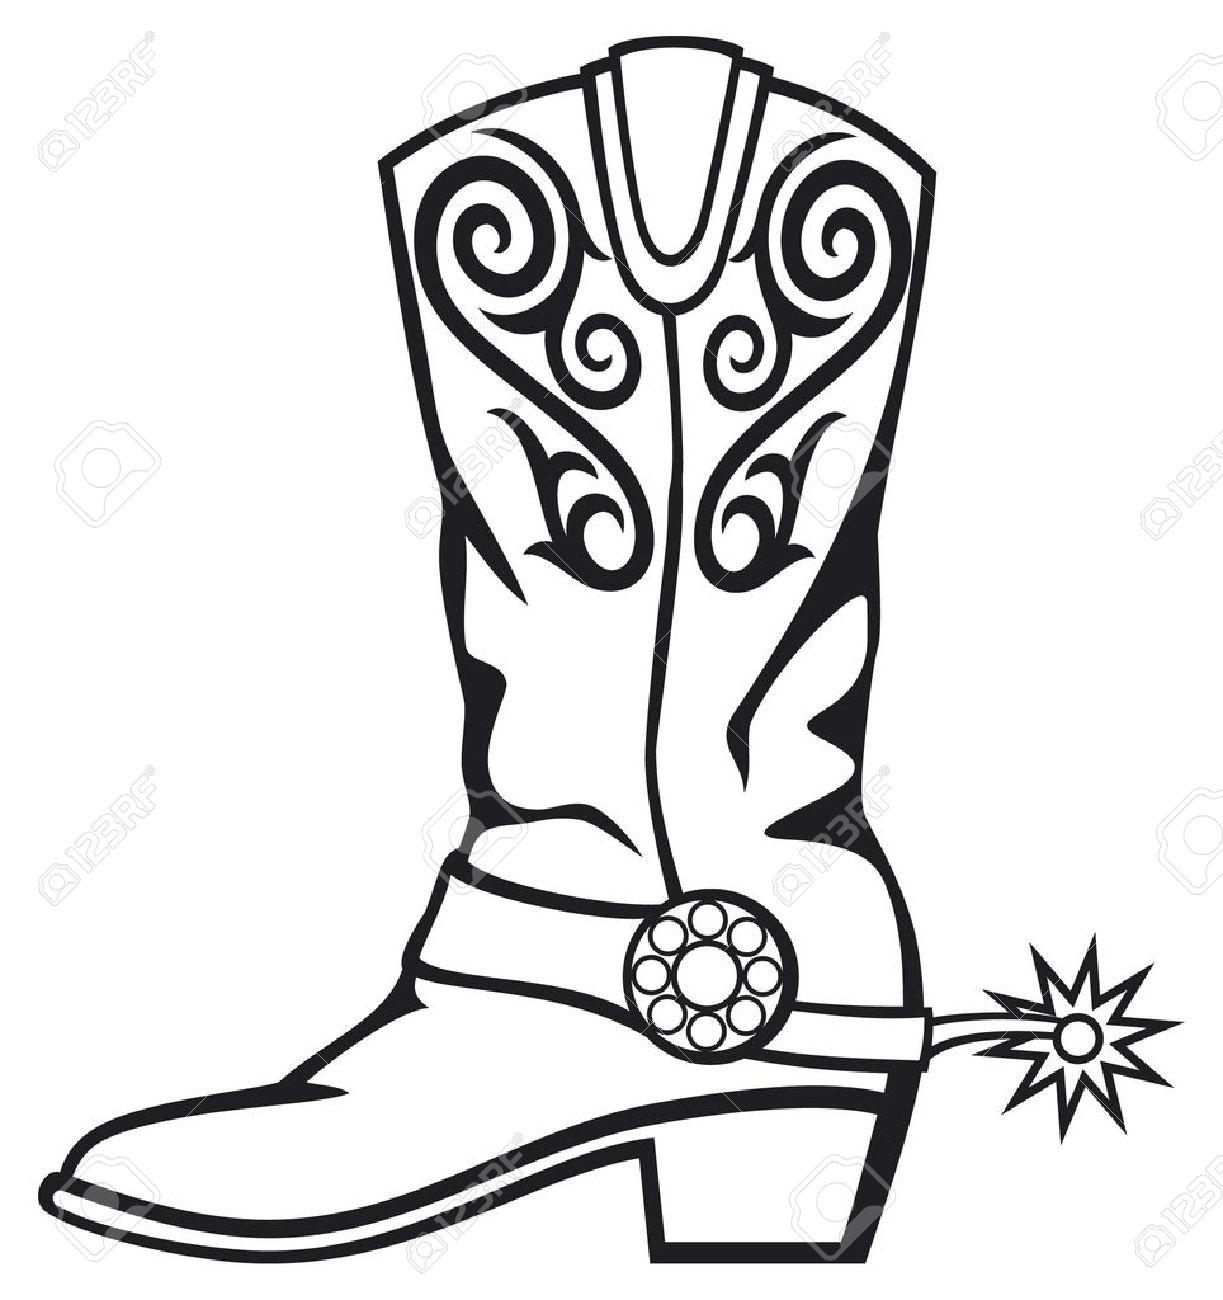 1223x1300 Drawn Boots Cowboy